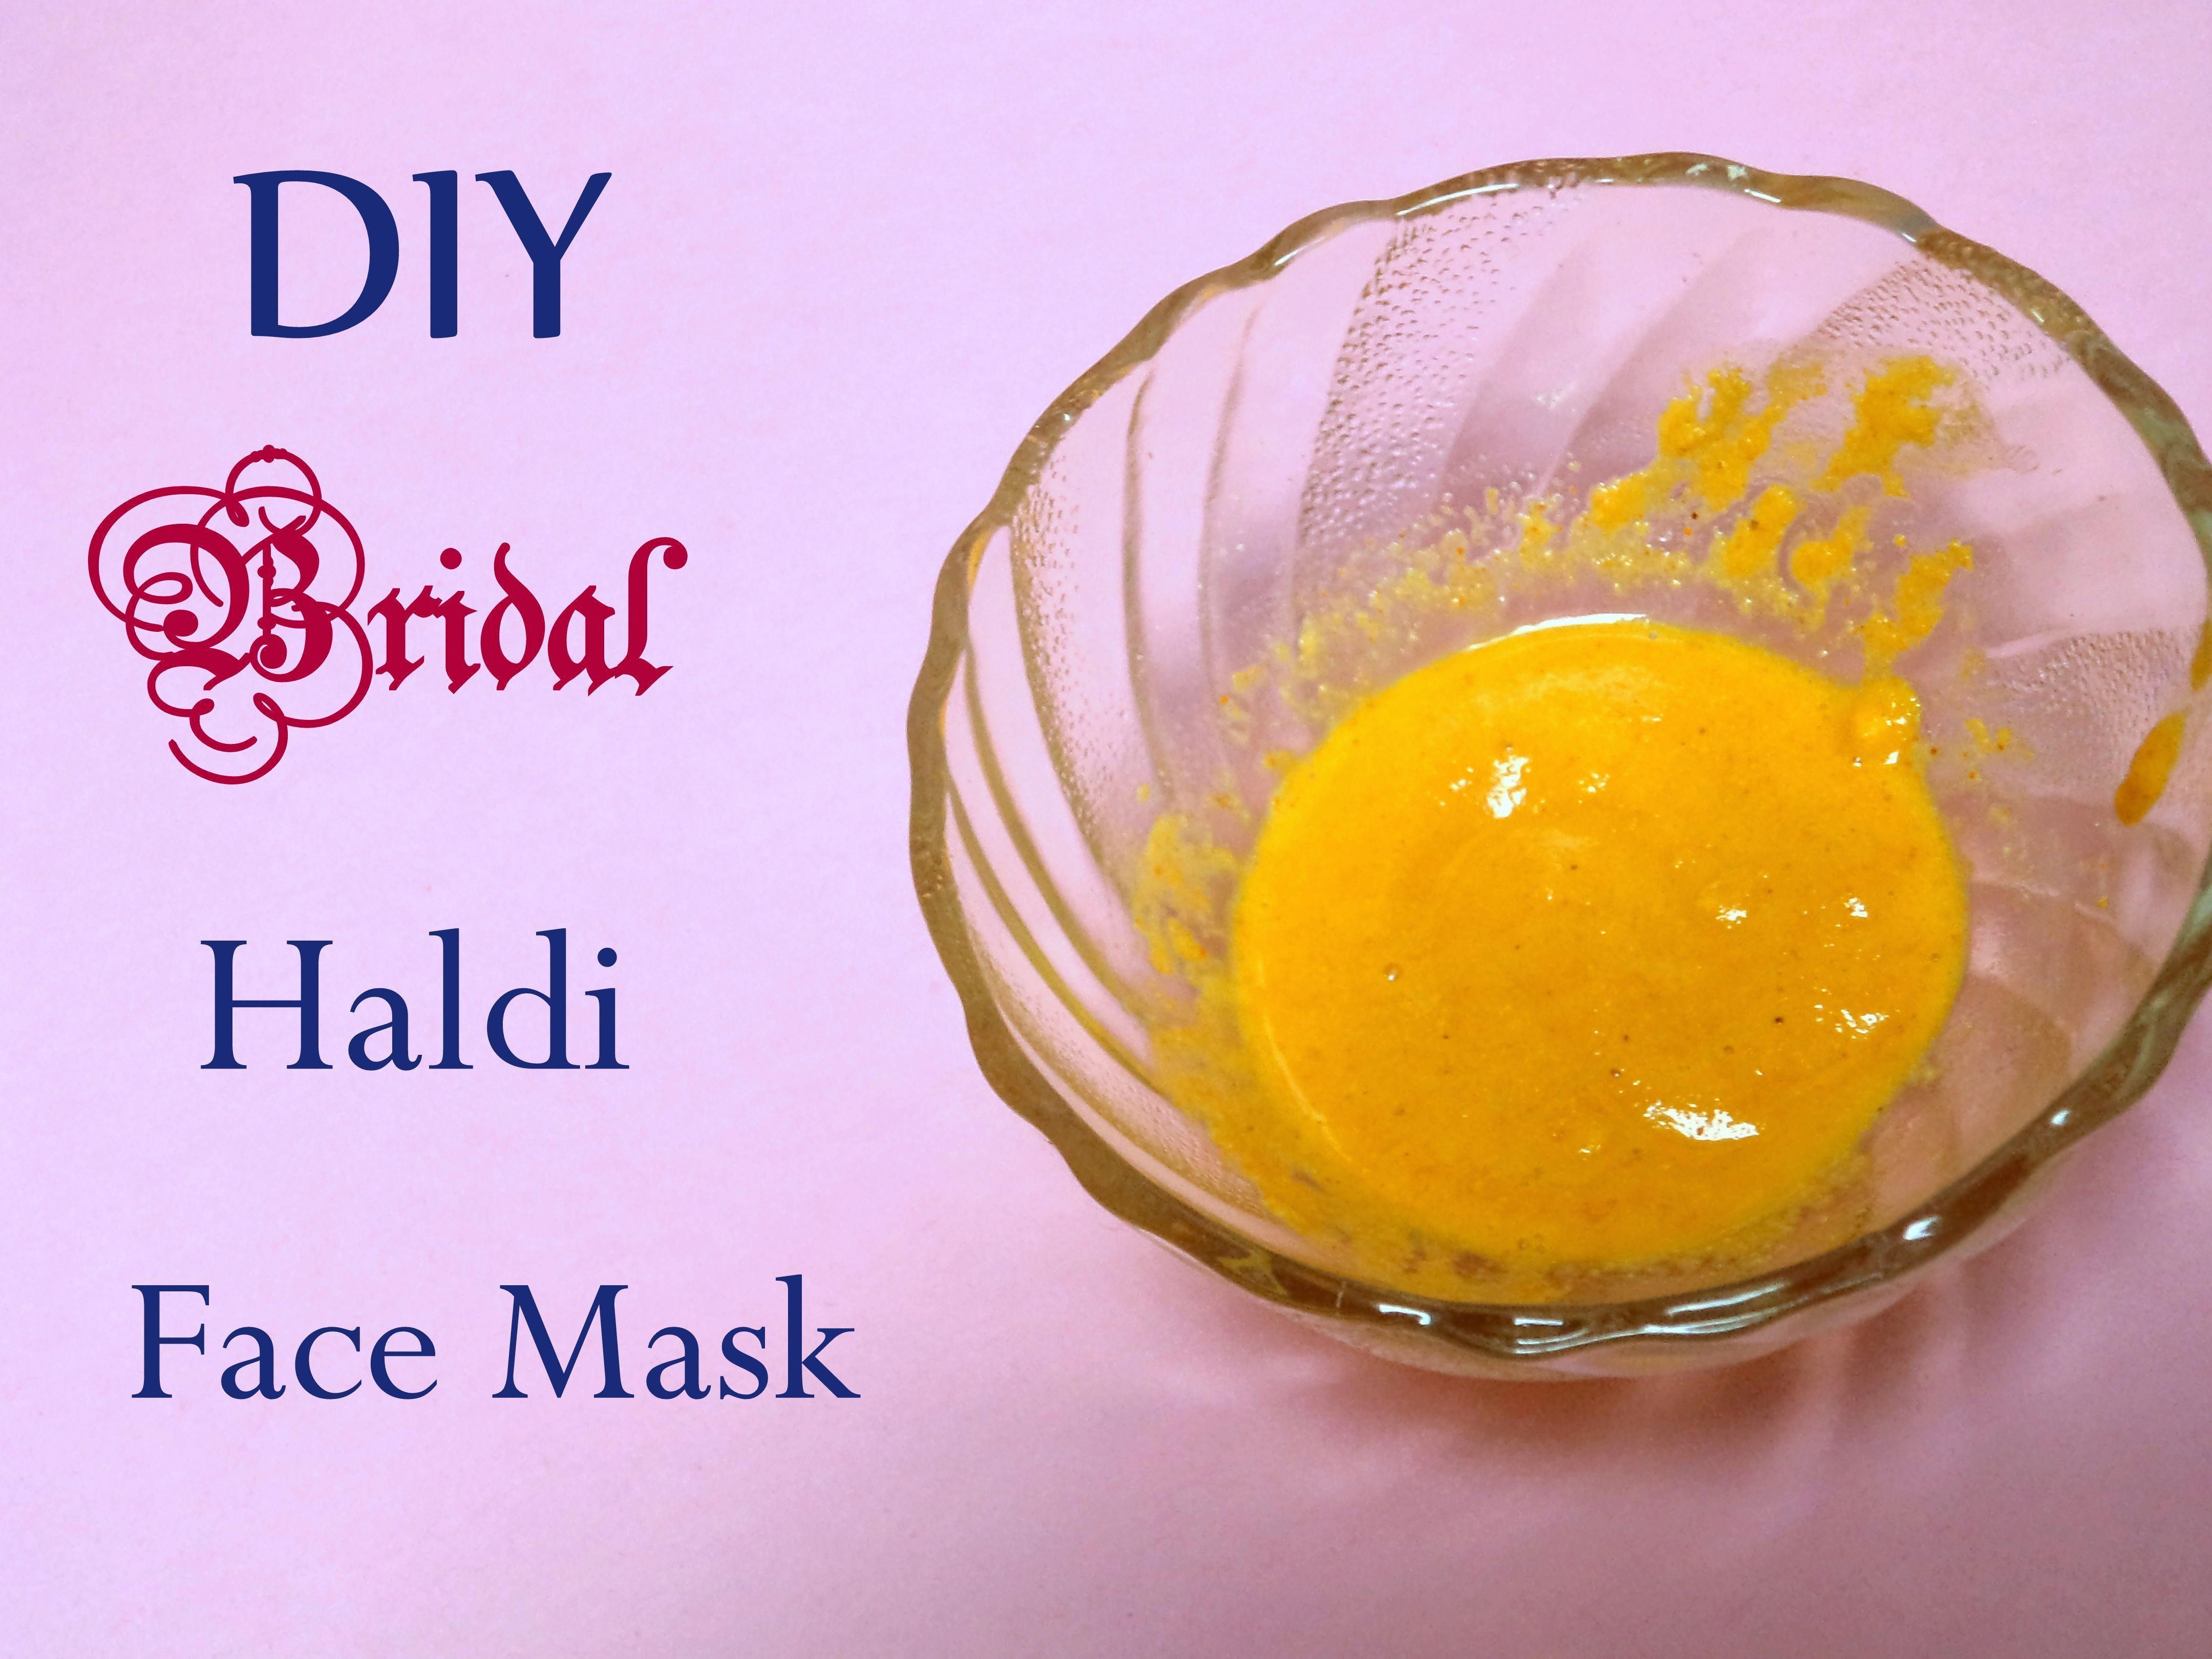 Home made ubtan recipe using haldi and besan as